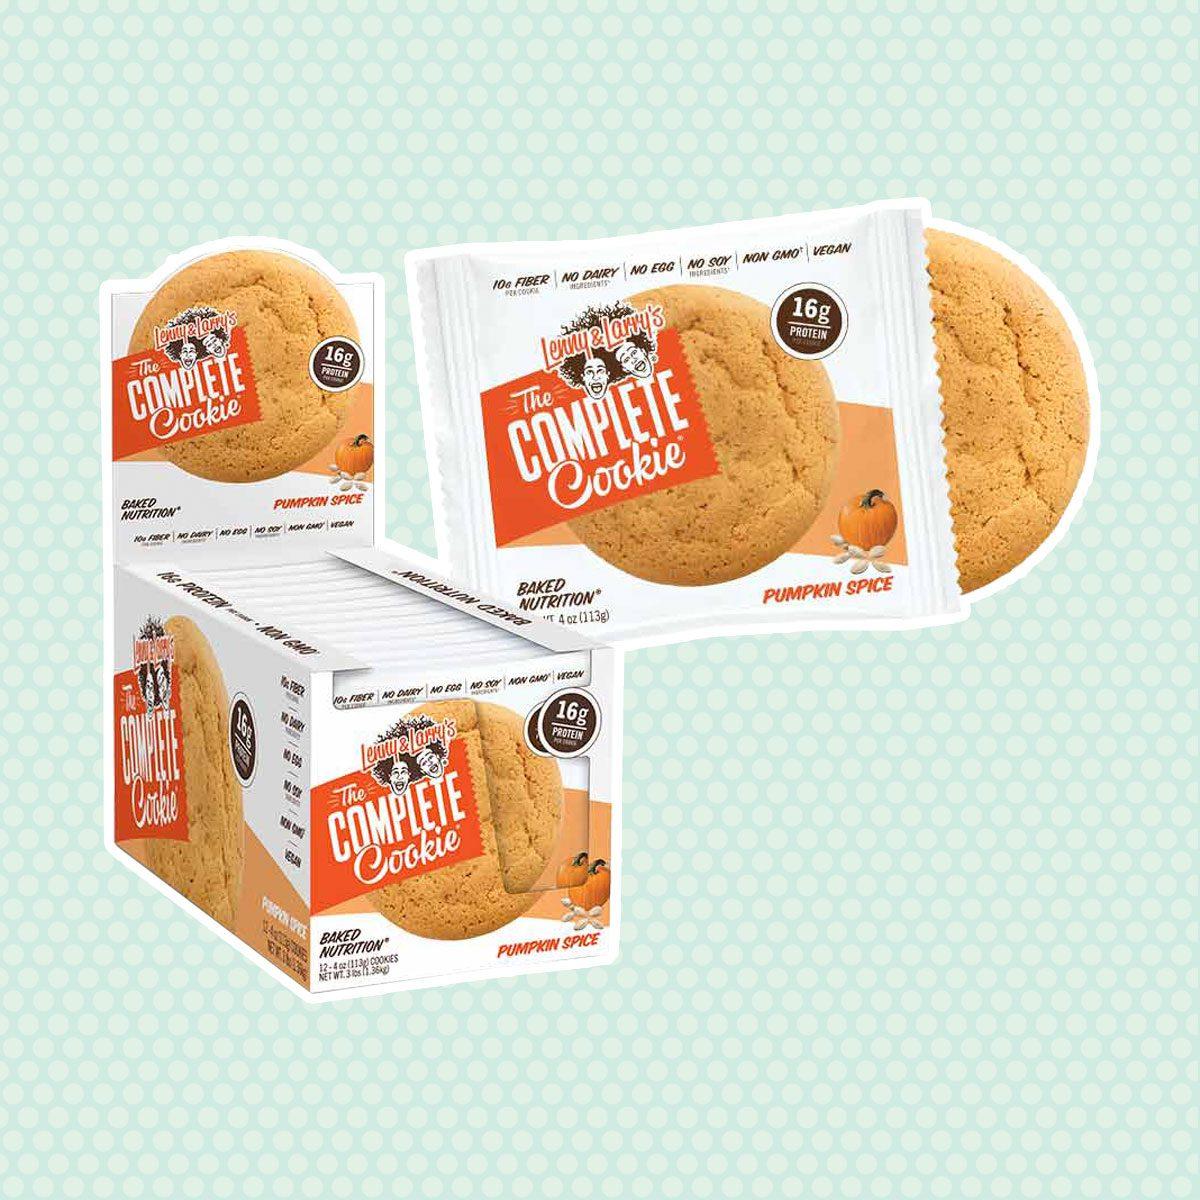 Lenny & Larry's Pumpkin Spice Complete Cookie